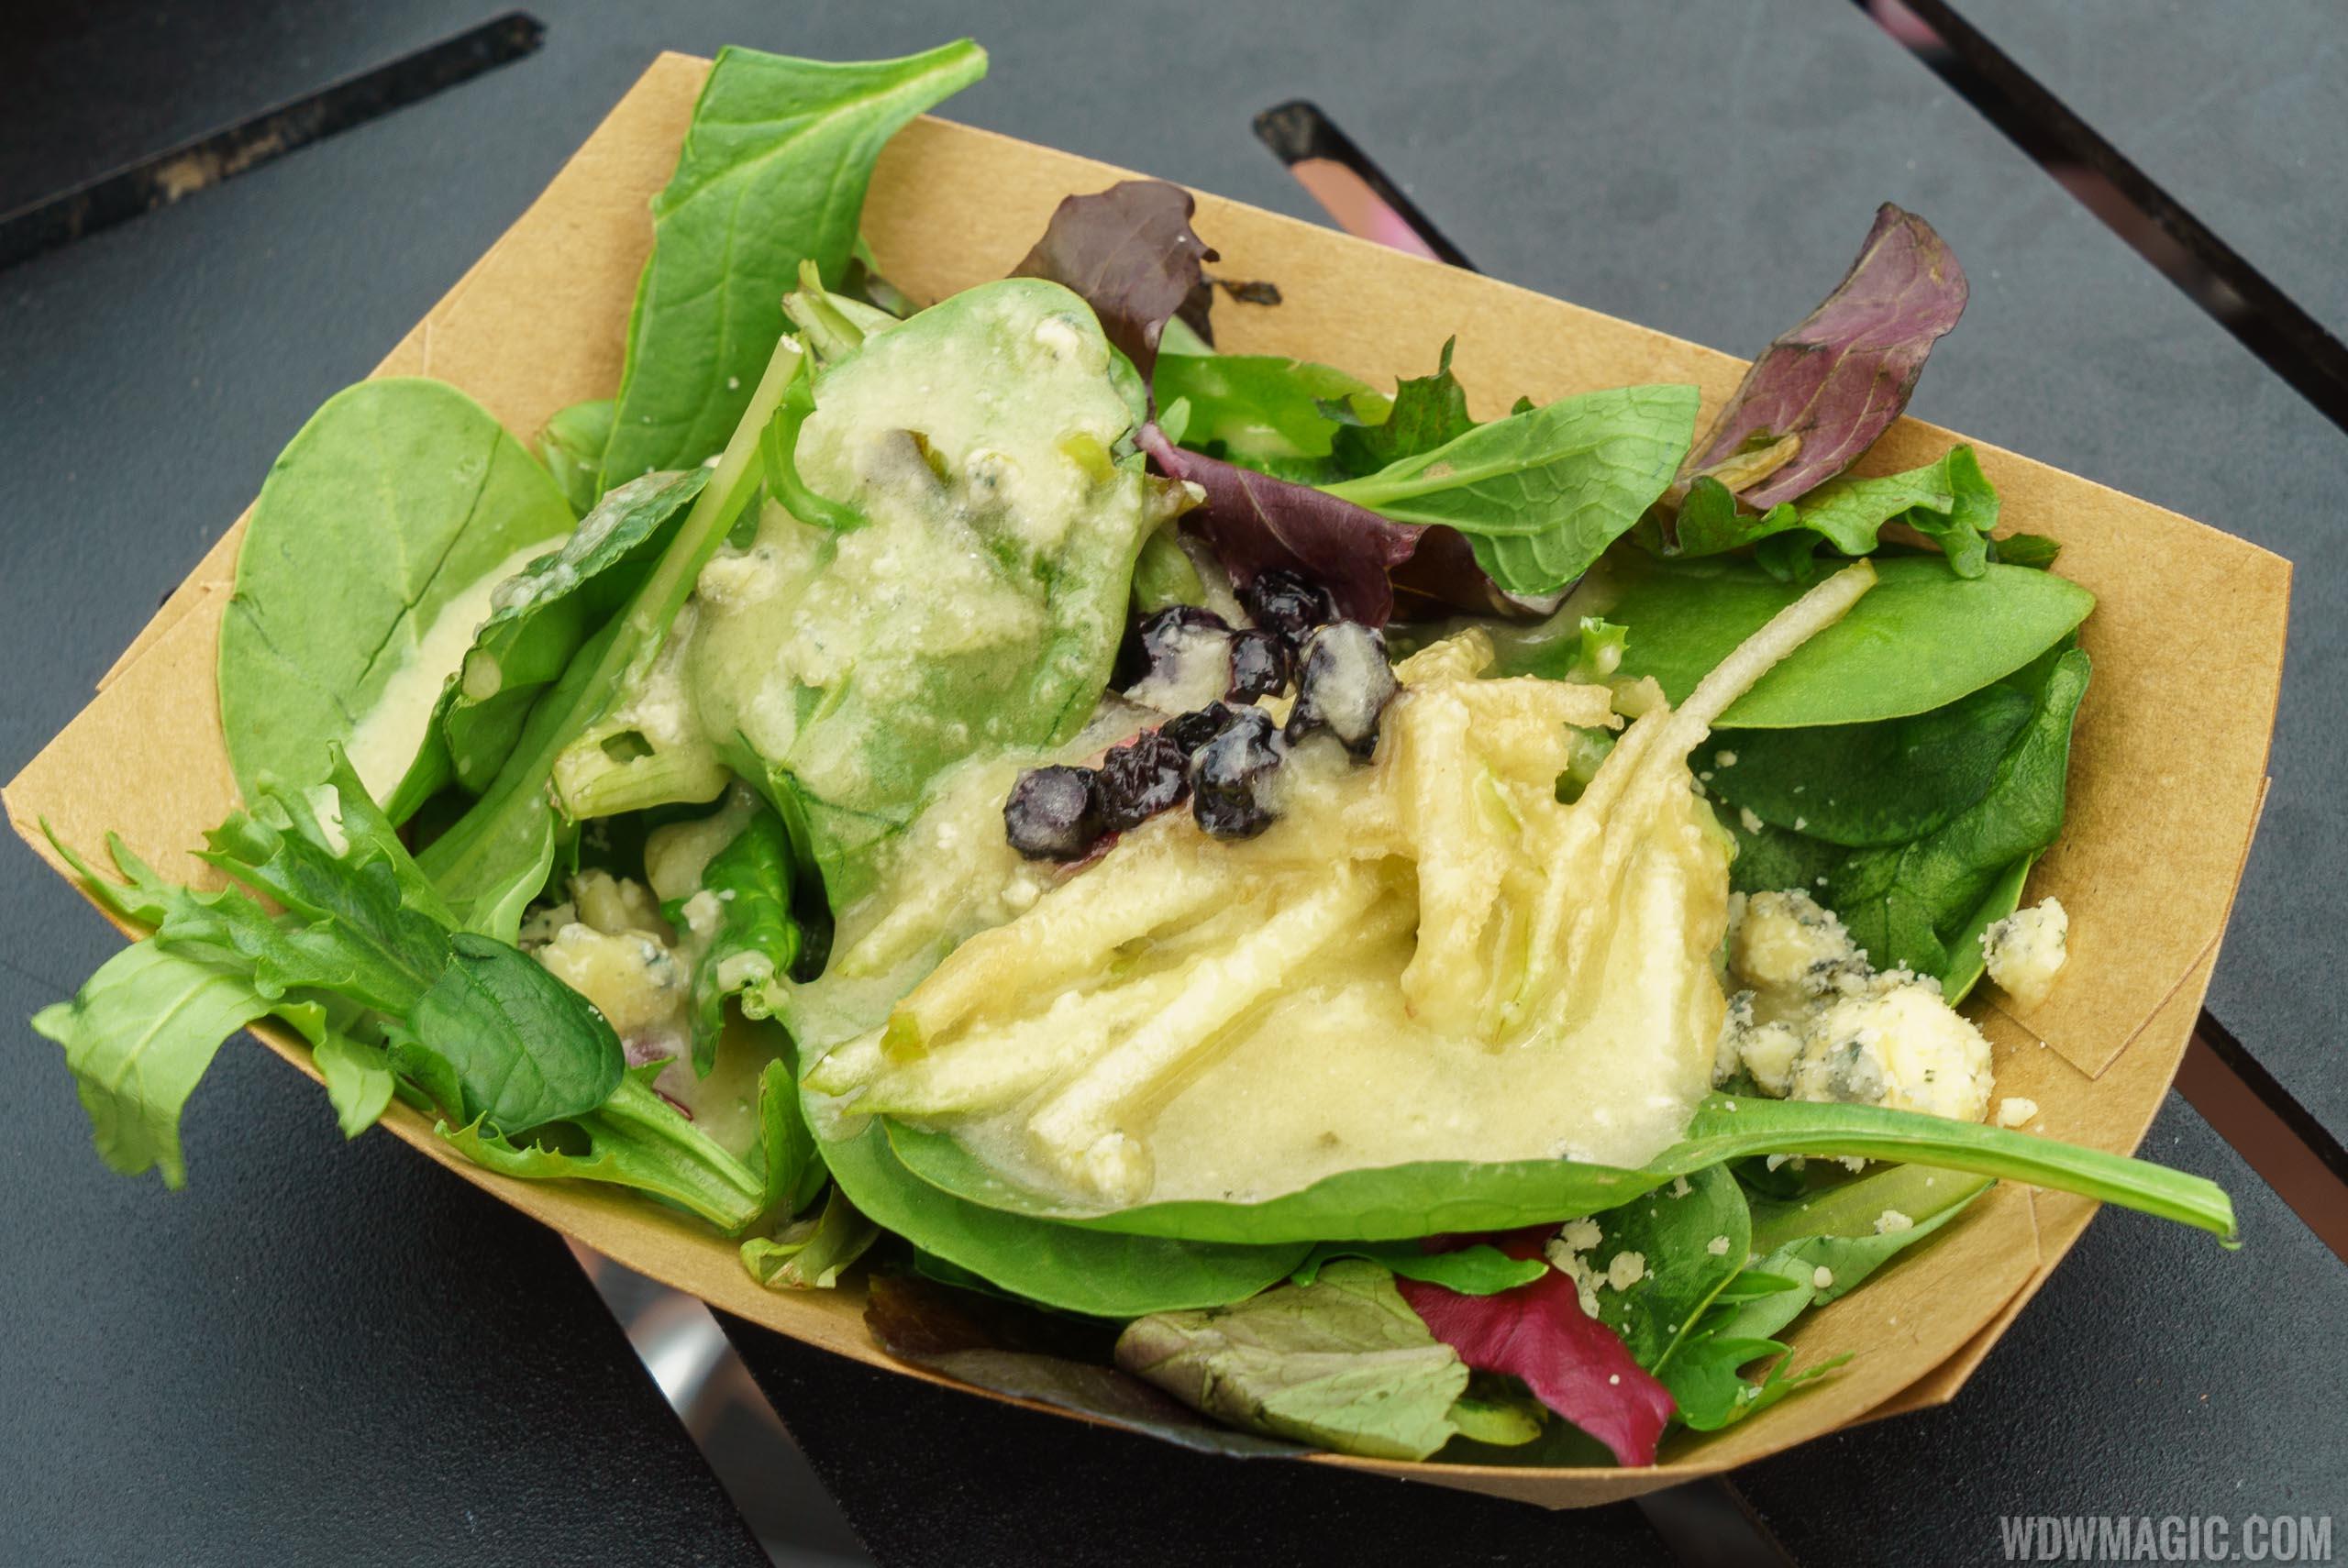 2016 Epcot Flower and Garden Festival Outdoor Kitchen kiosks food